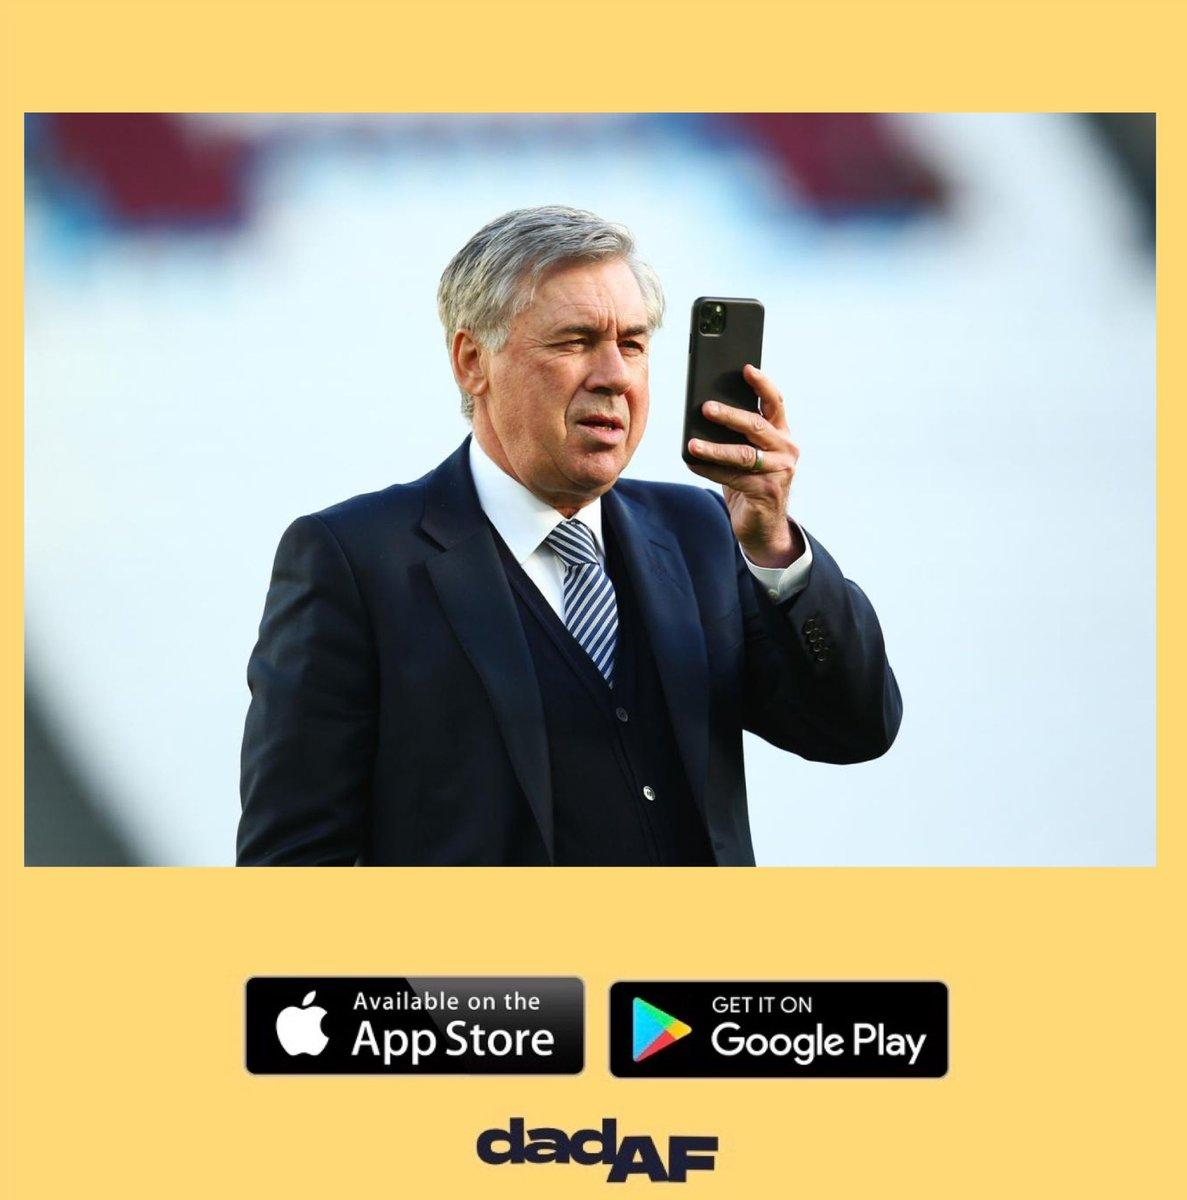 Even Carlo is on the Dad AF app • • • #dad #dadaf #dadlife #dads #carloancelotti #everton #football #manager #footballcoach #dadcommunity #dadnetwork #footballcommunity #footballdads #footballkids #parenting #parentingapppic.twitter.com/lO61xJvluy